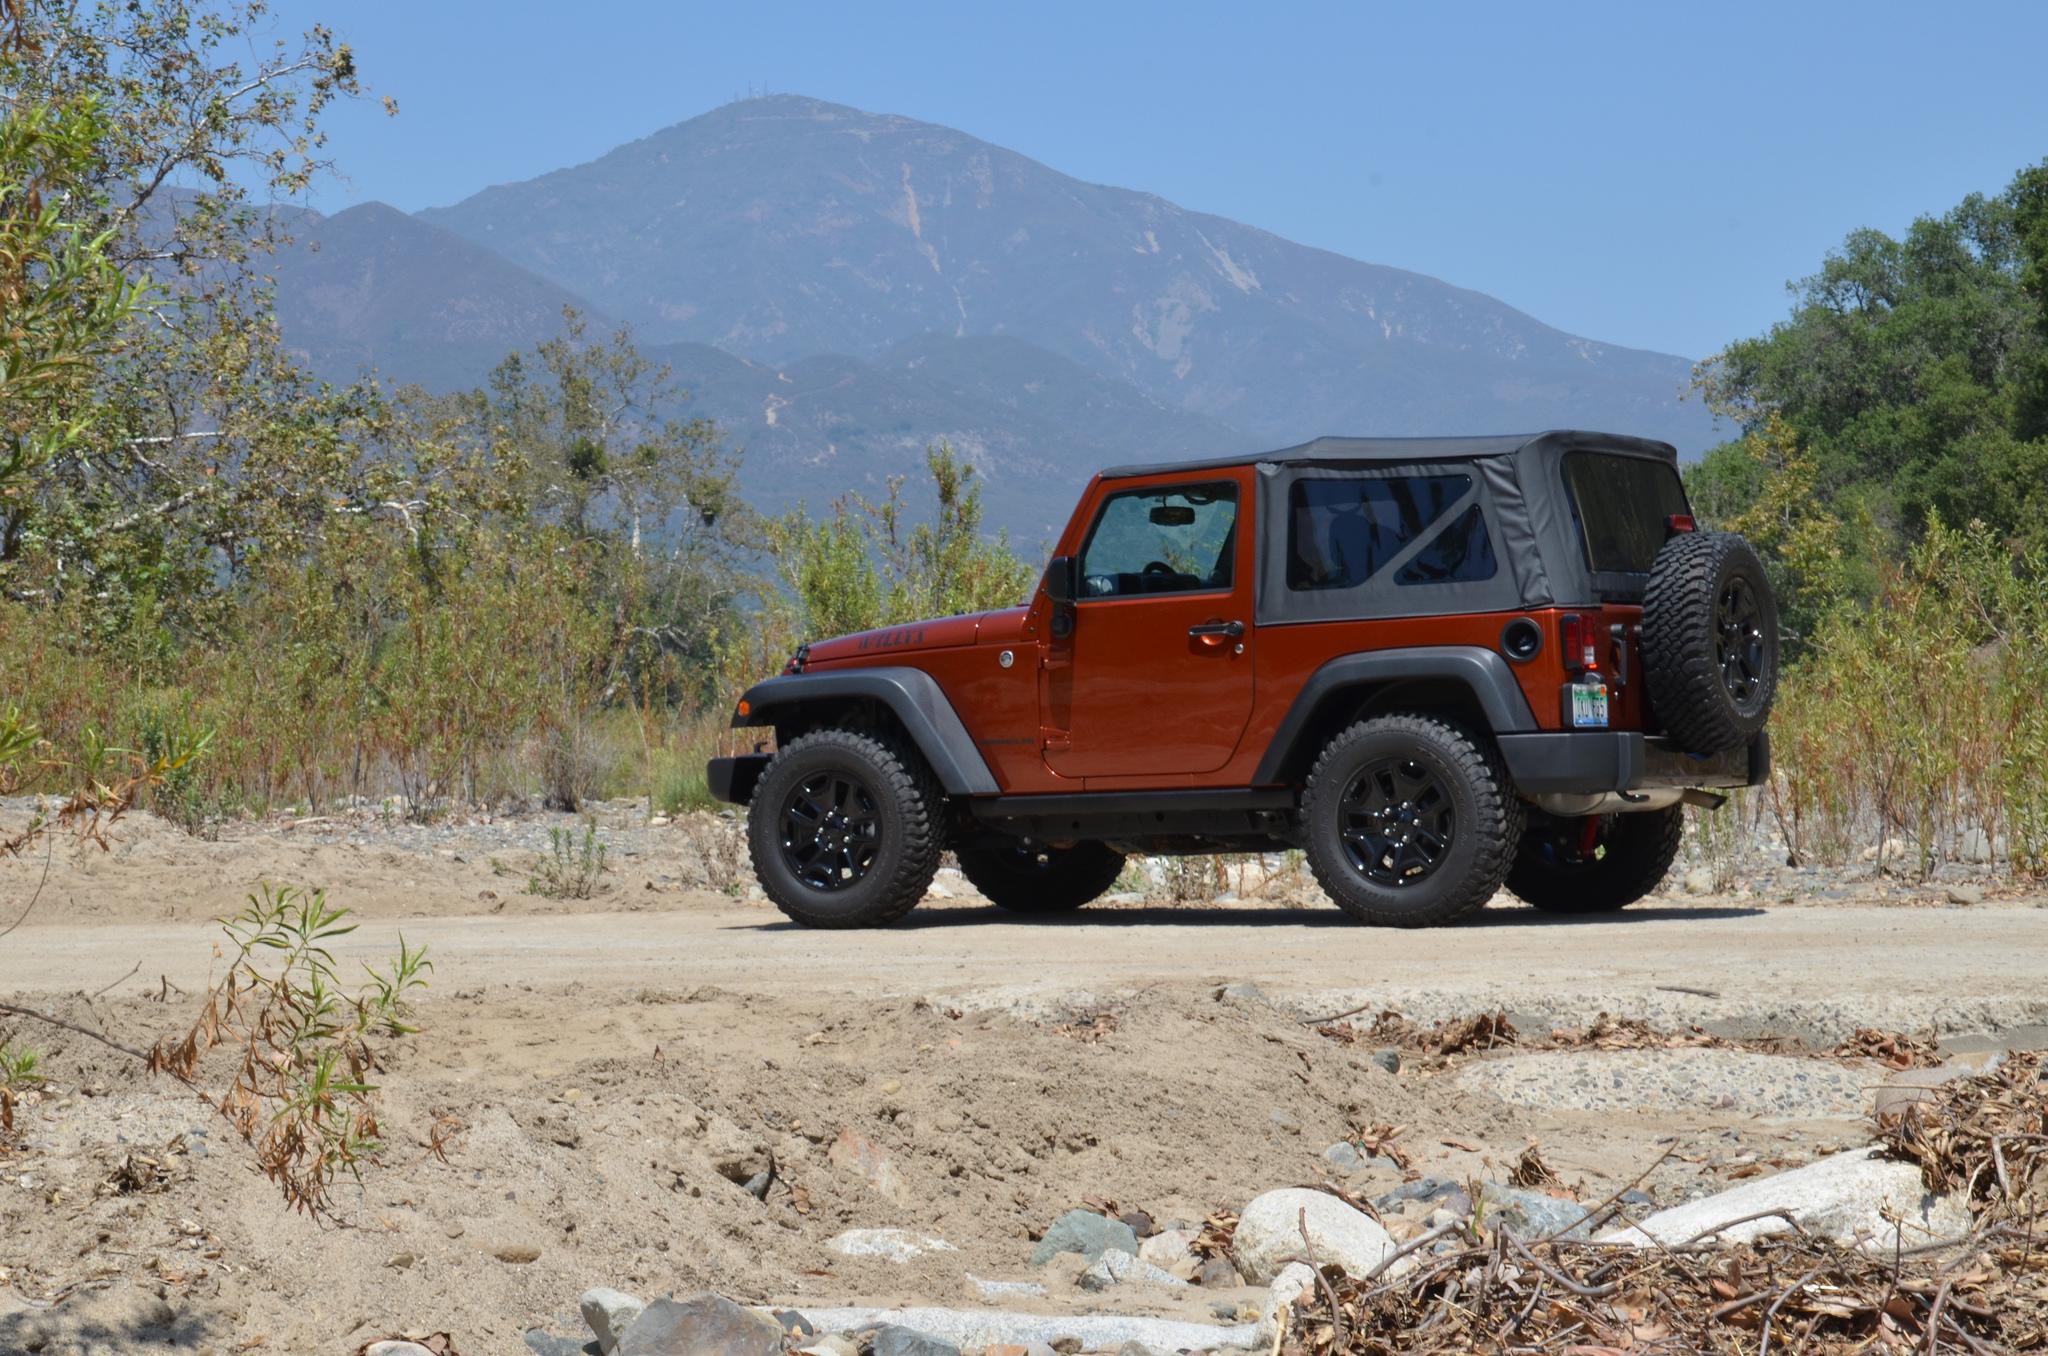 2015 jeep wrangler - iseecars